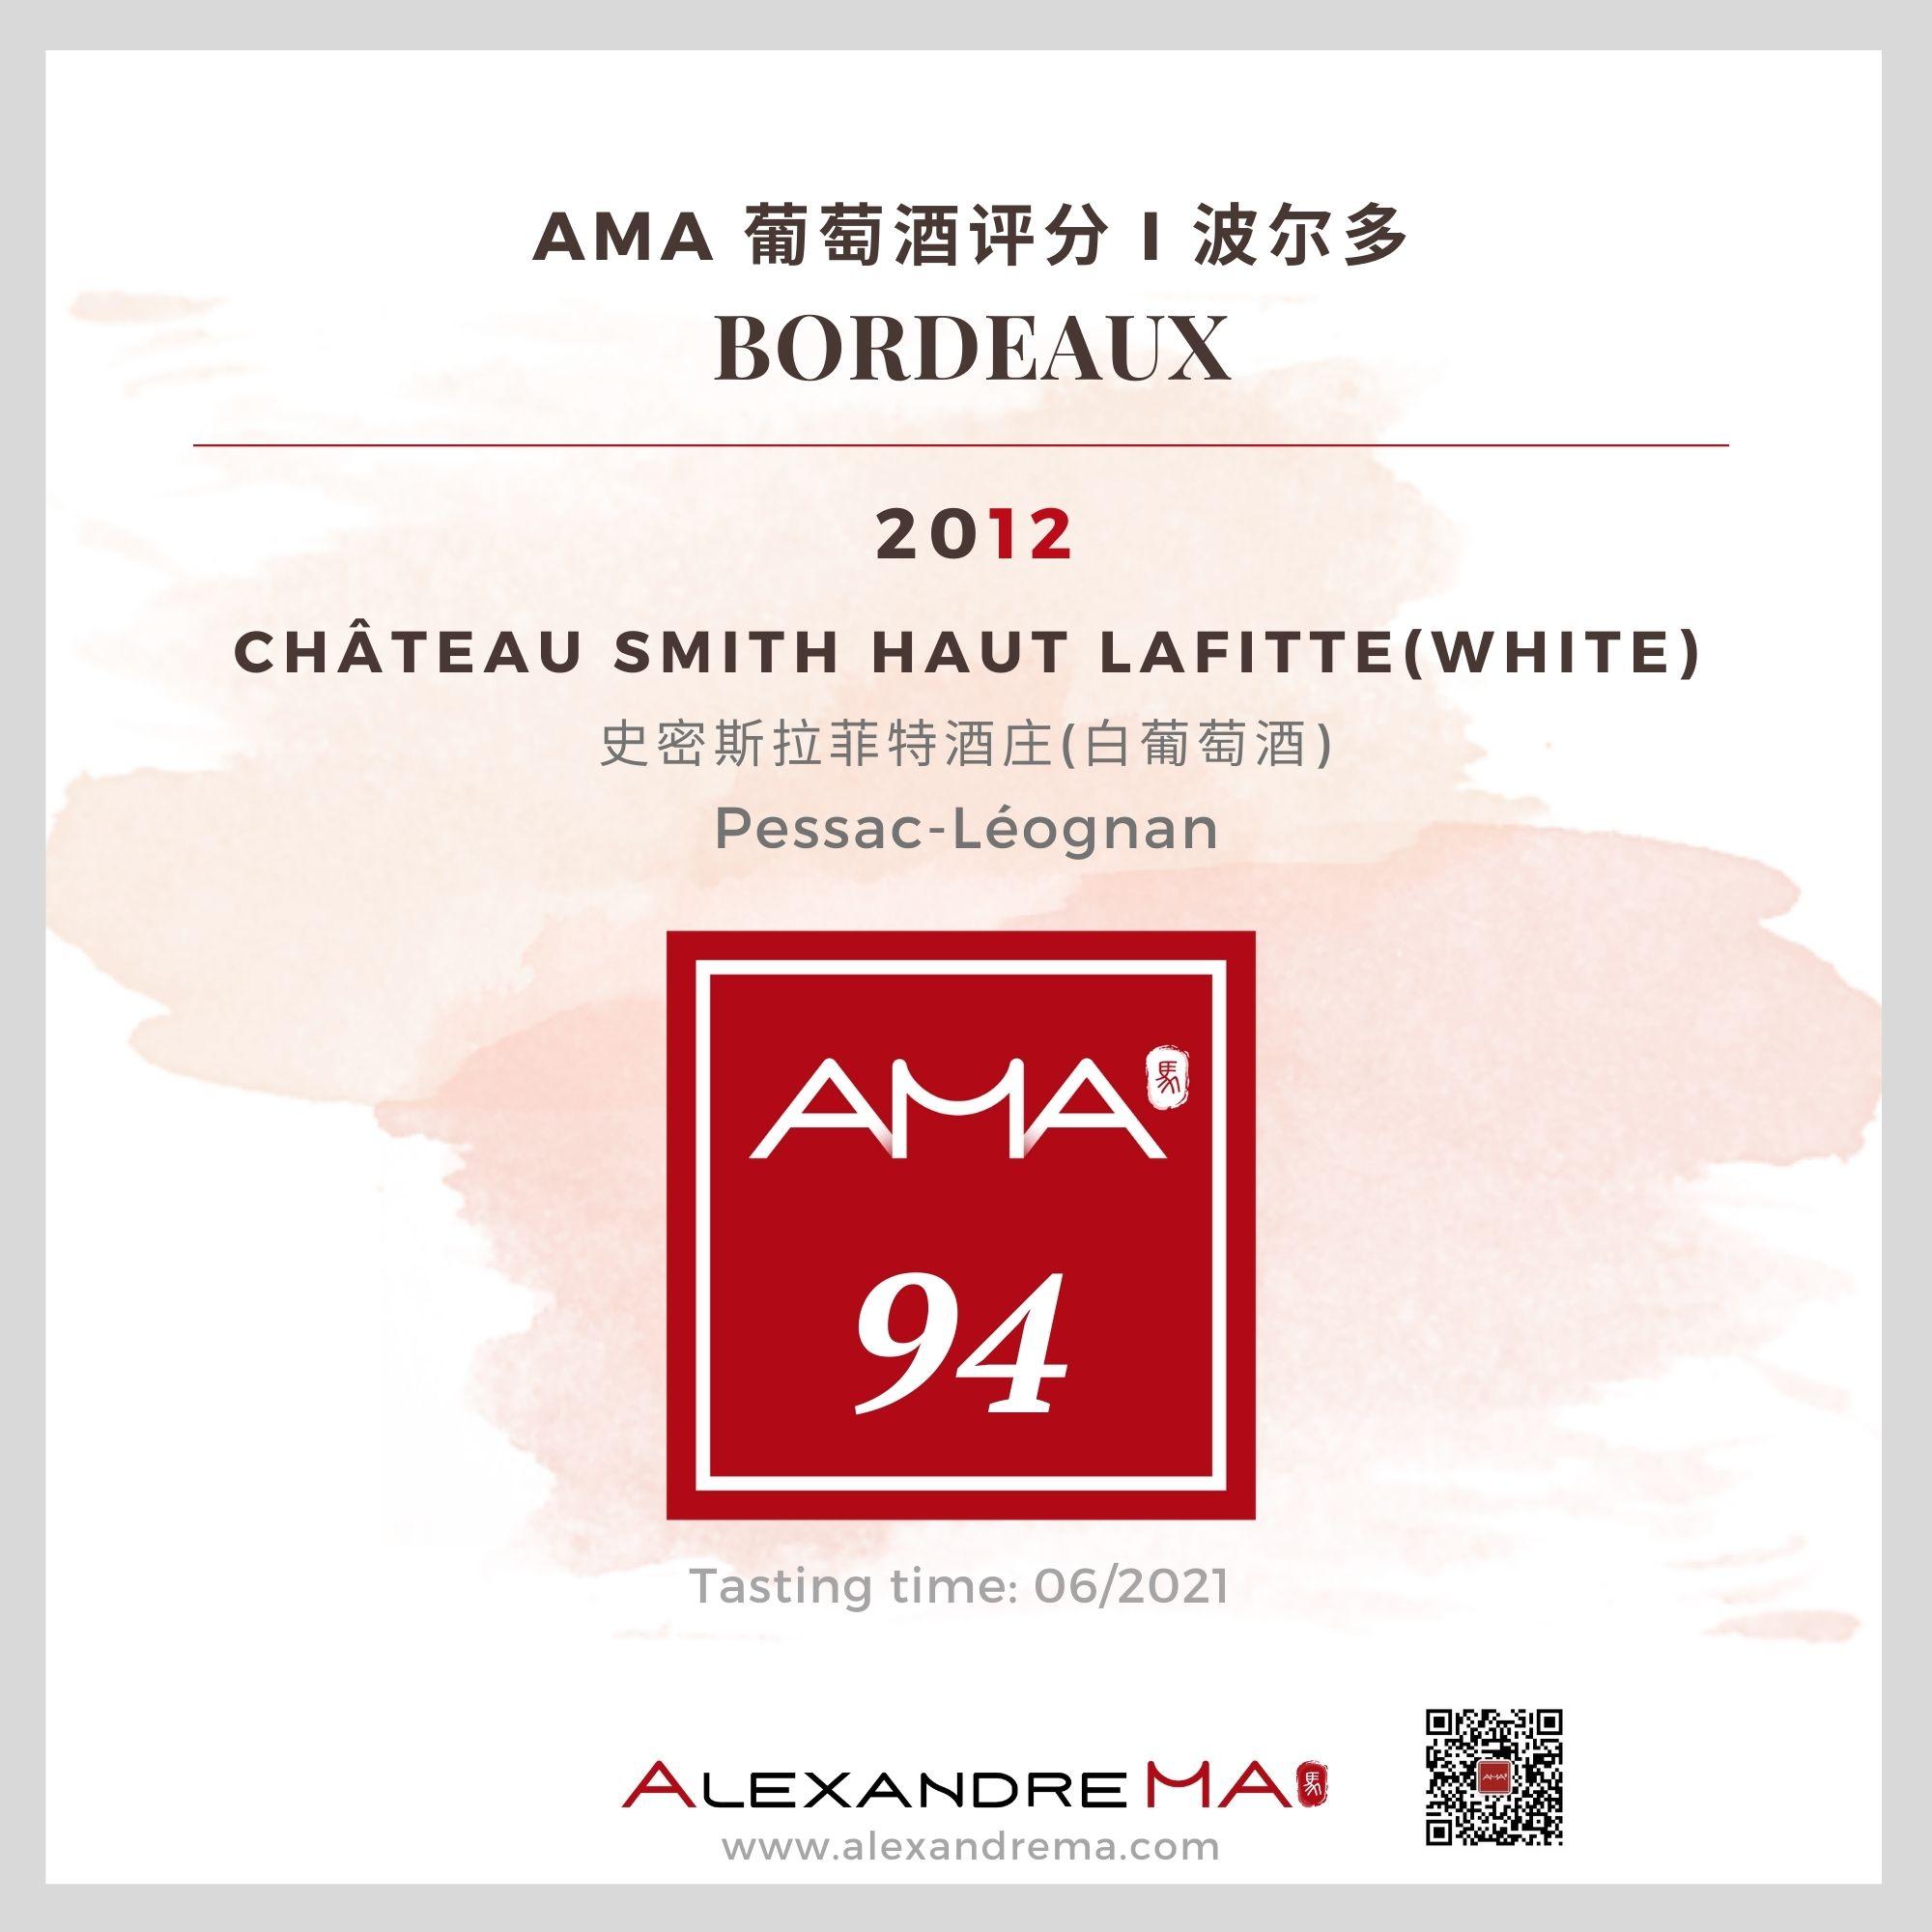 Château Smith Haut Lafitte White 2012 史密斯拉菲特酒庄 - Alexandre Ma